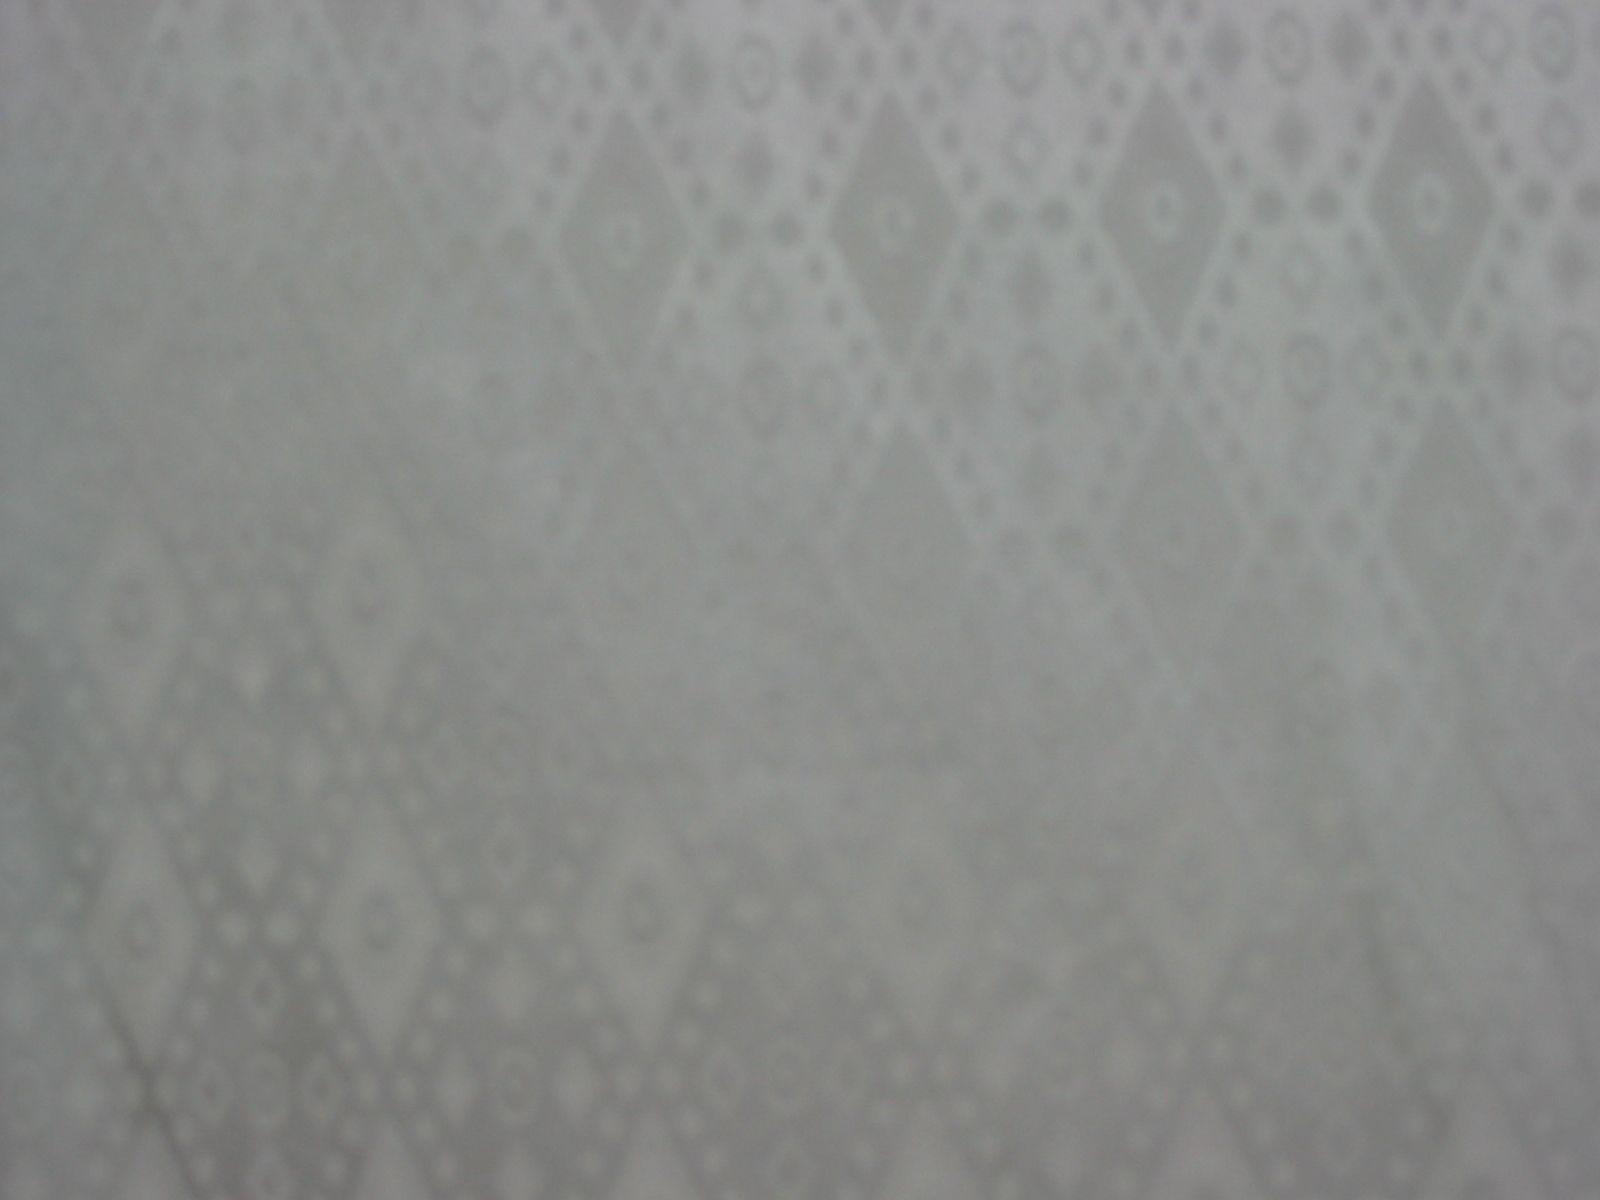 H10332 / PFD         / POLY/SPANDEX JACQUARD